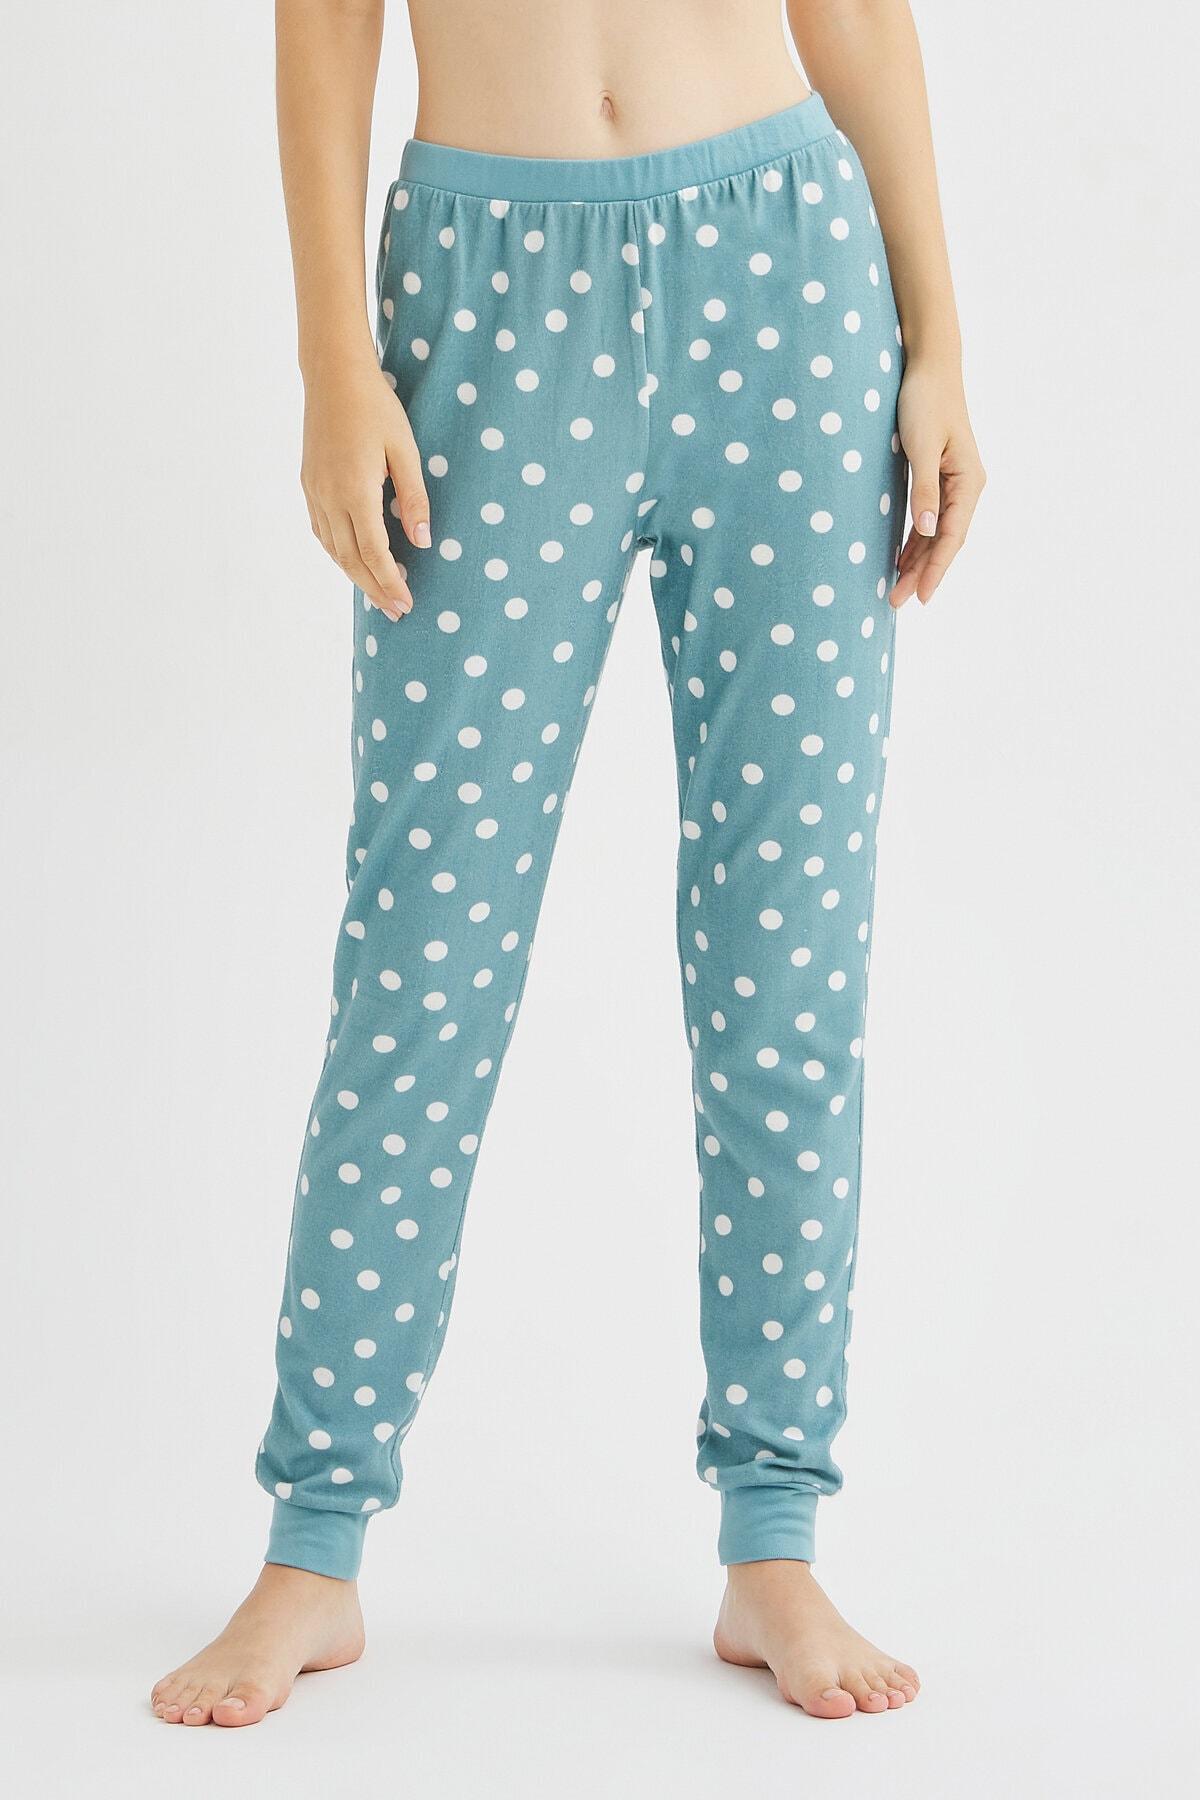 Penti Kadın Lazy Day Termal Pantolon